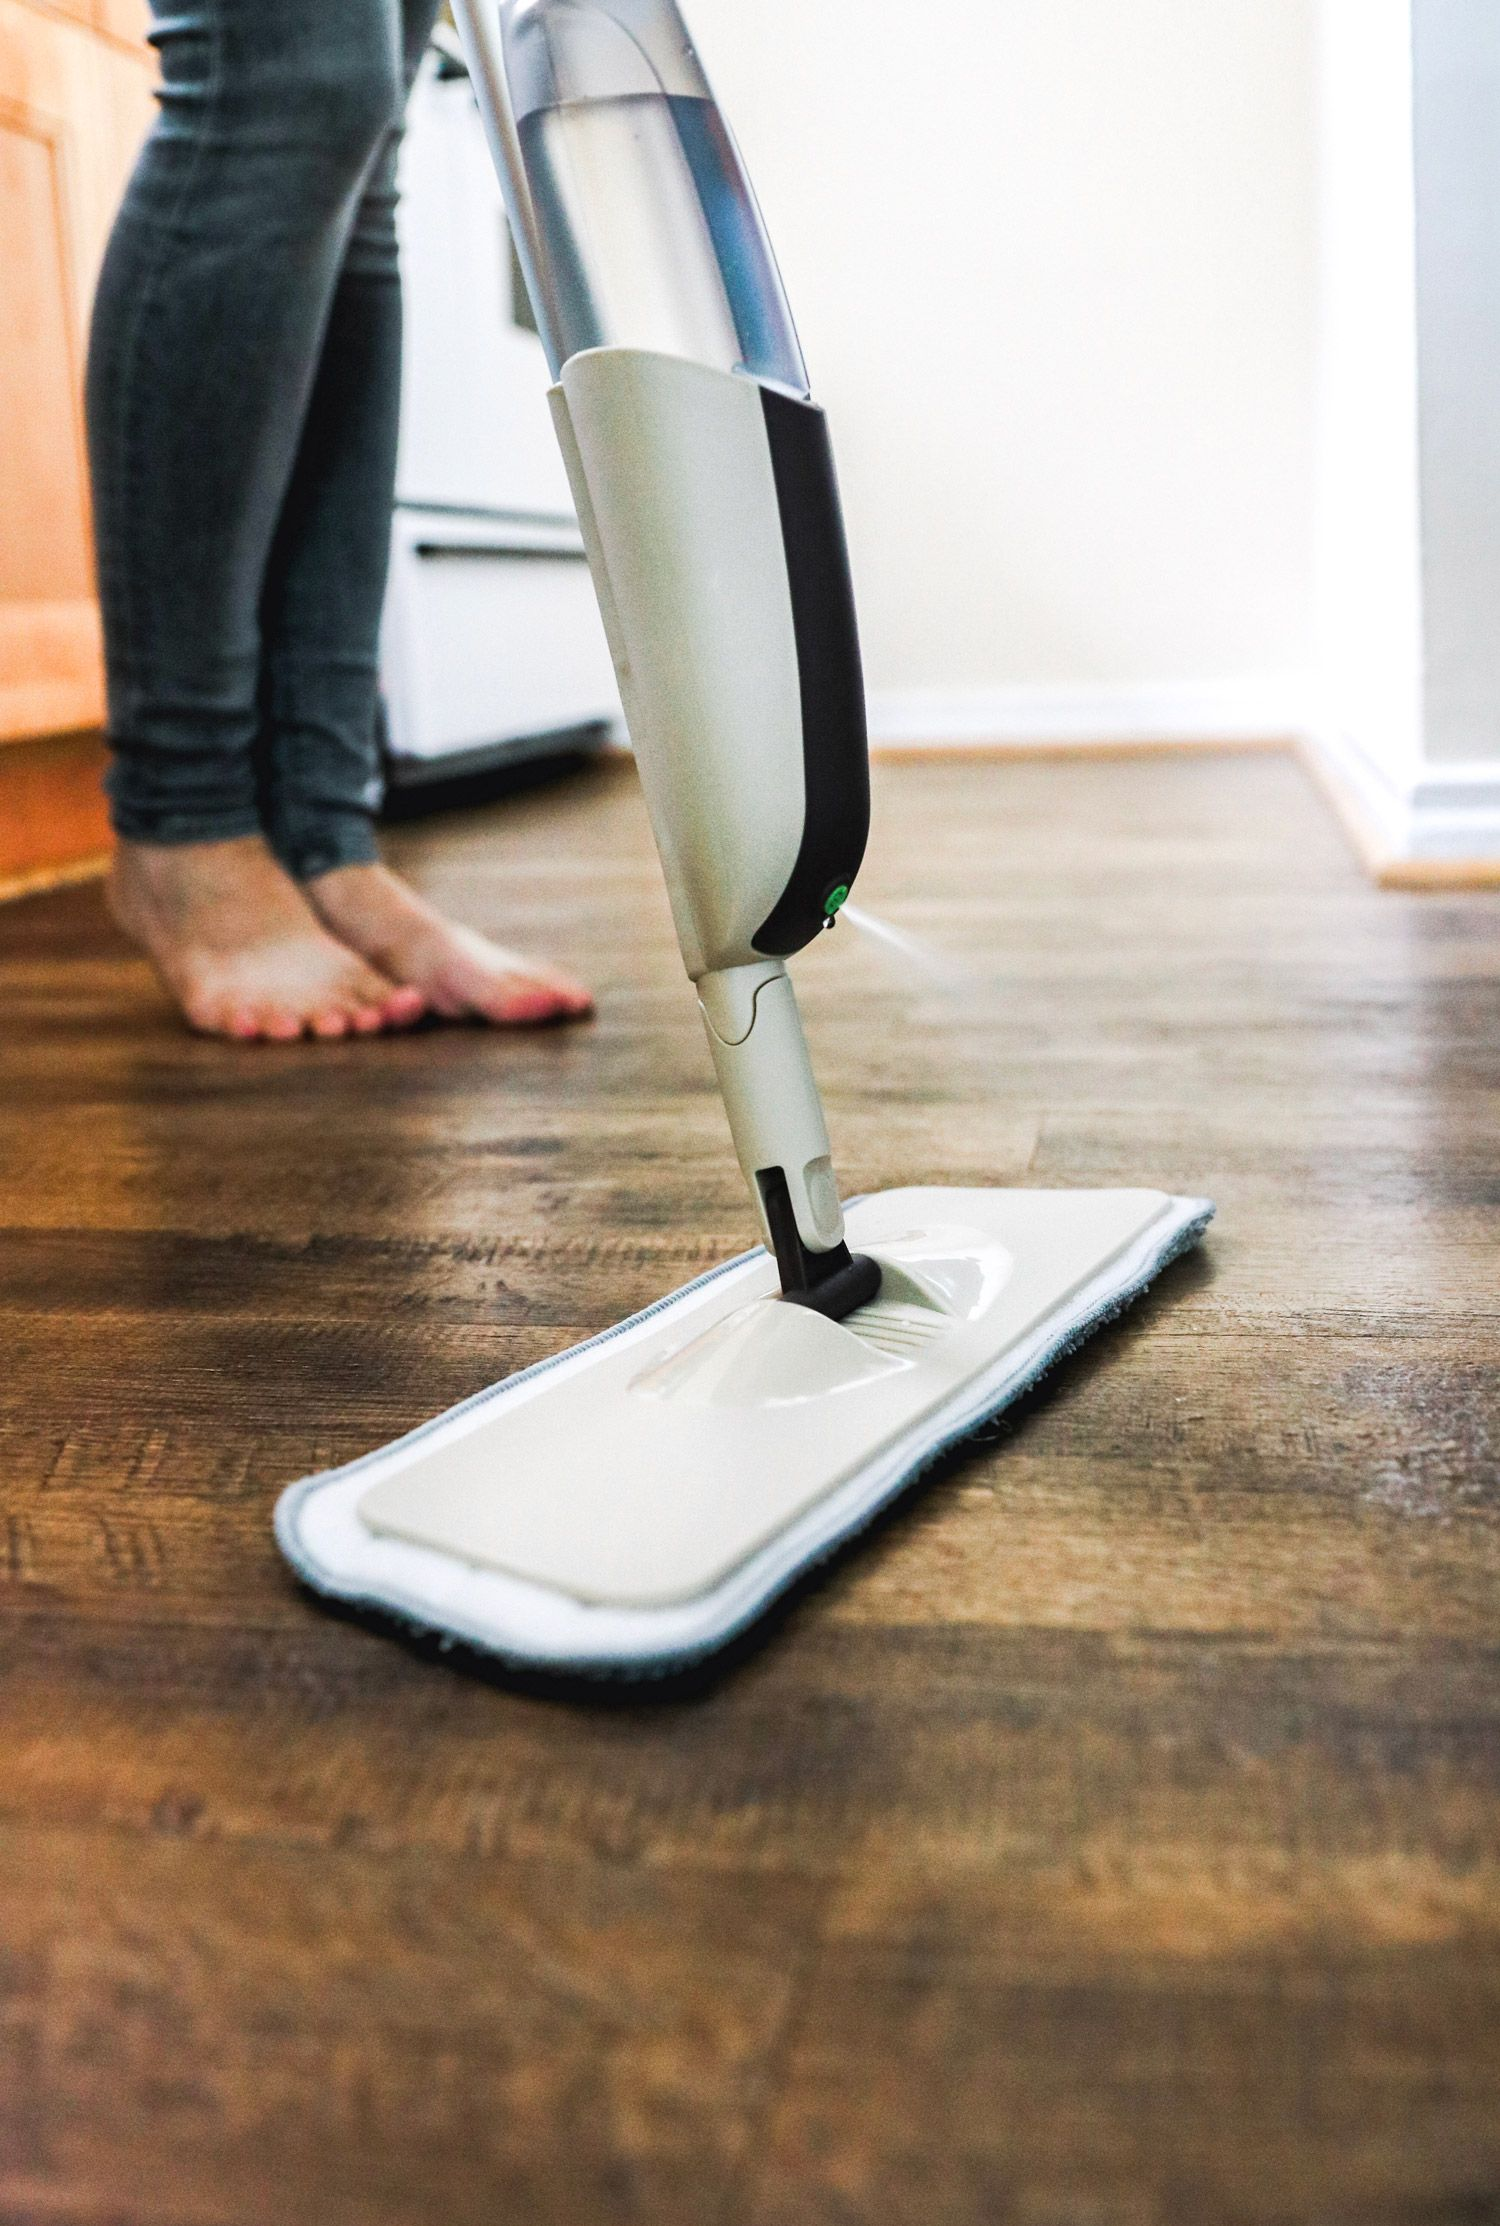 3ingredient laminate floor cleaner hello nest recipe